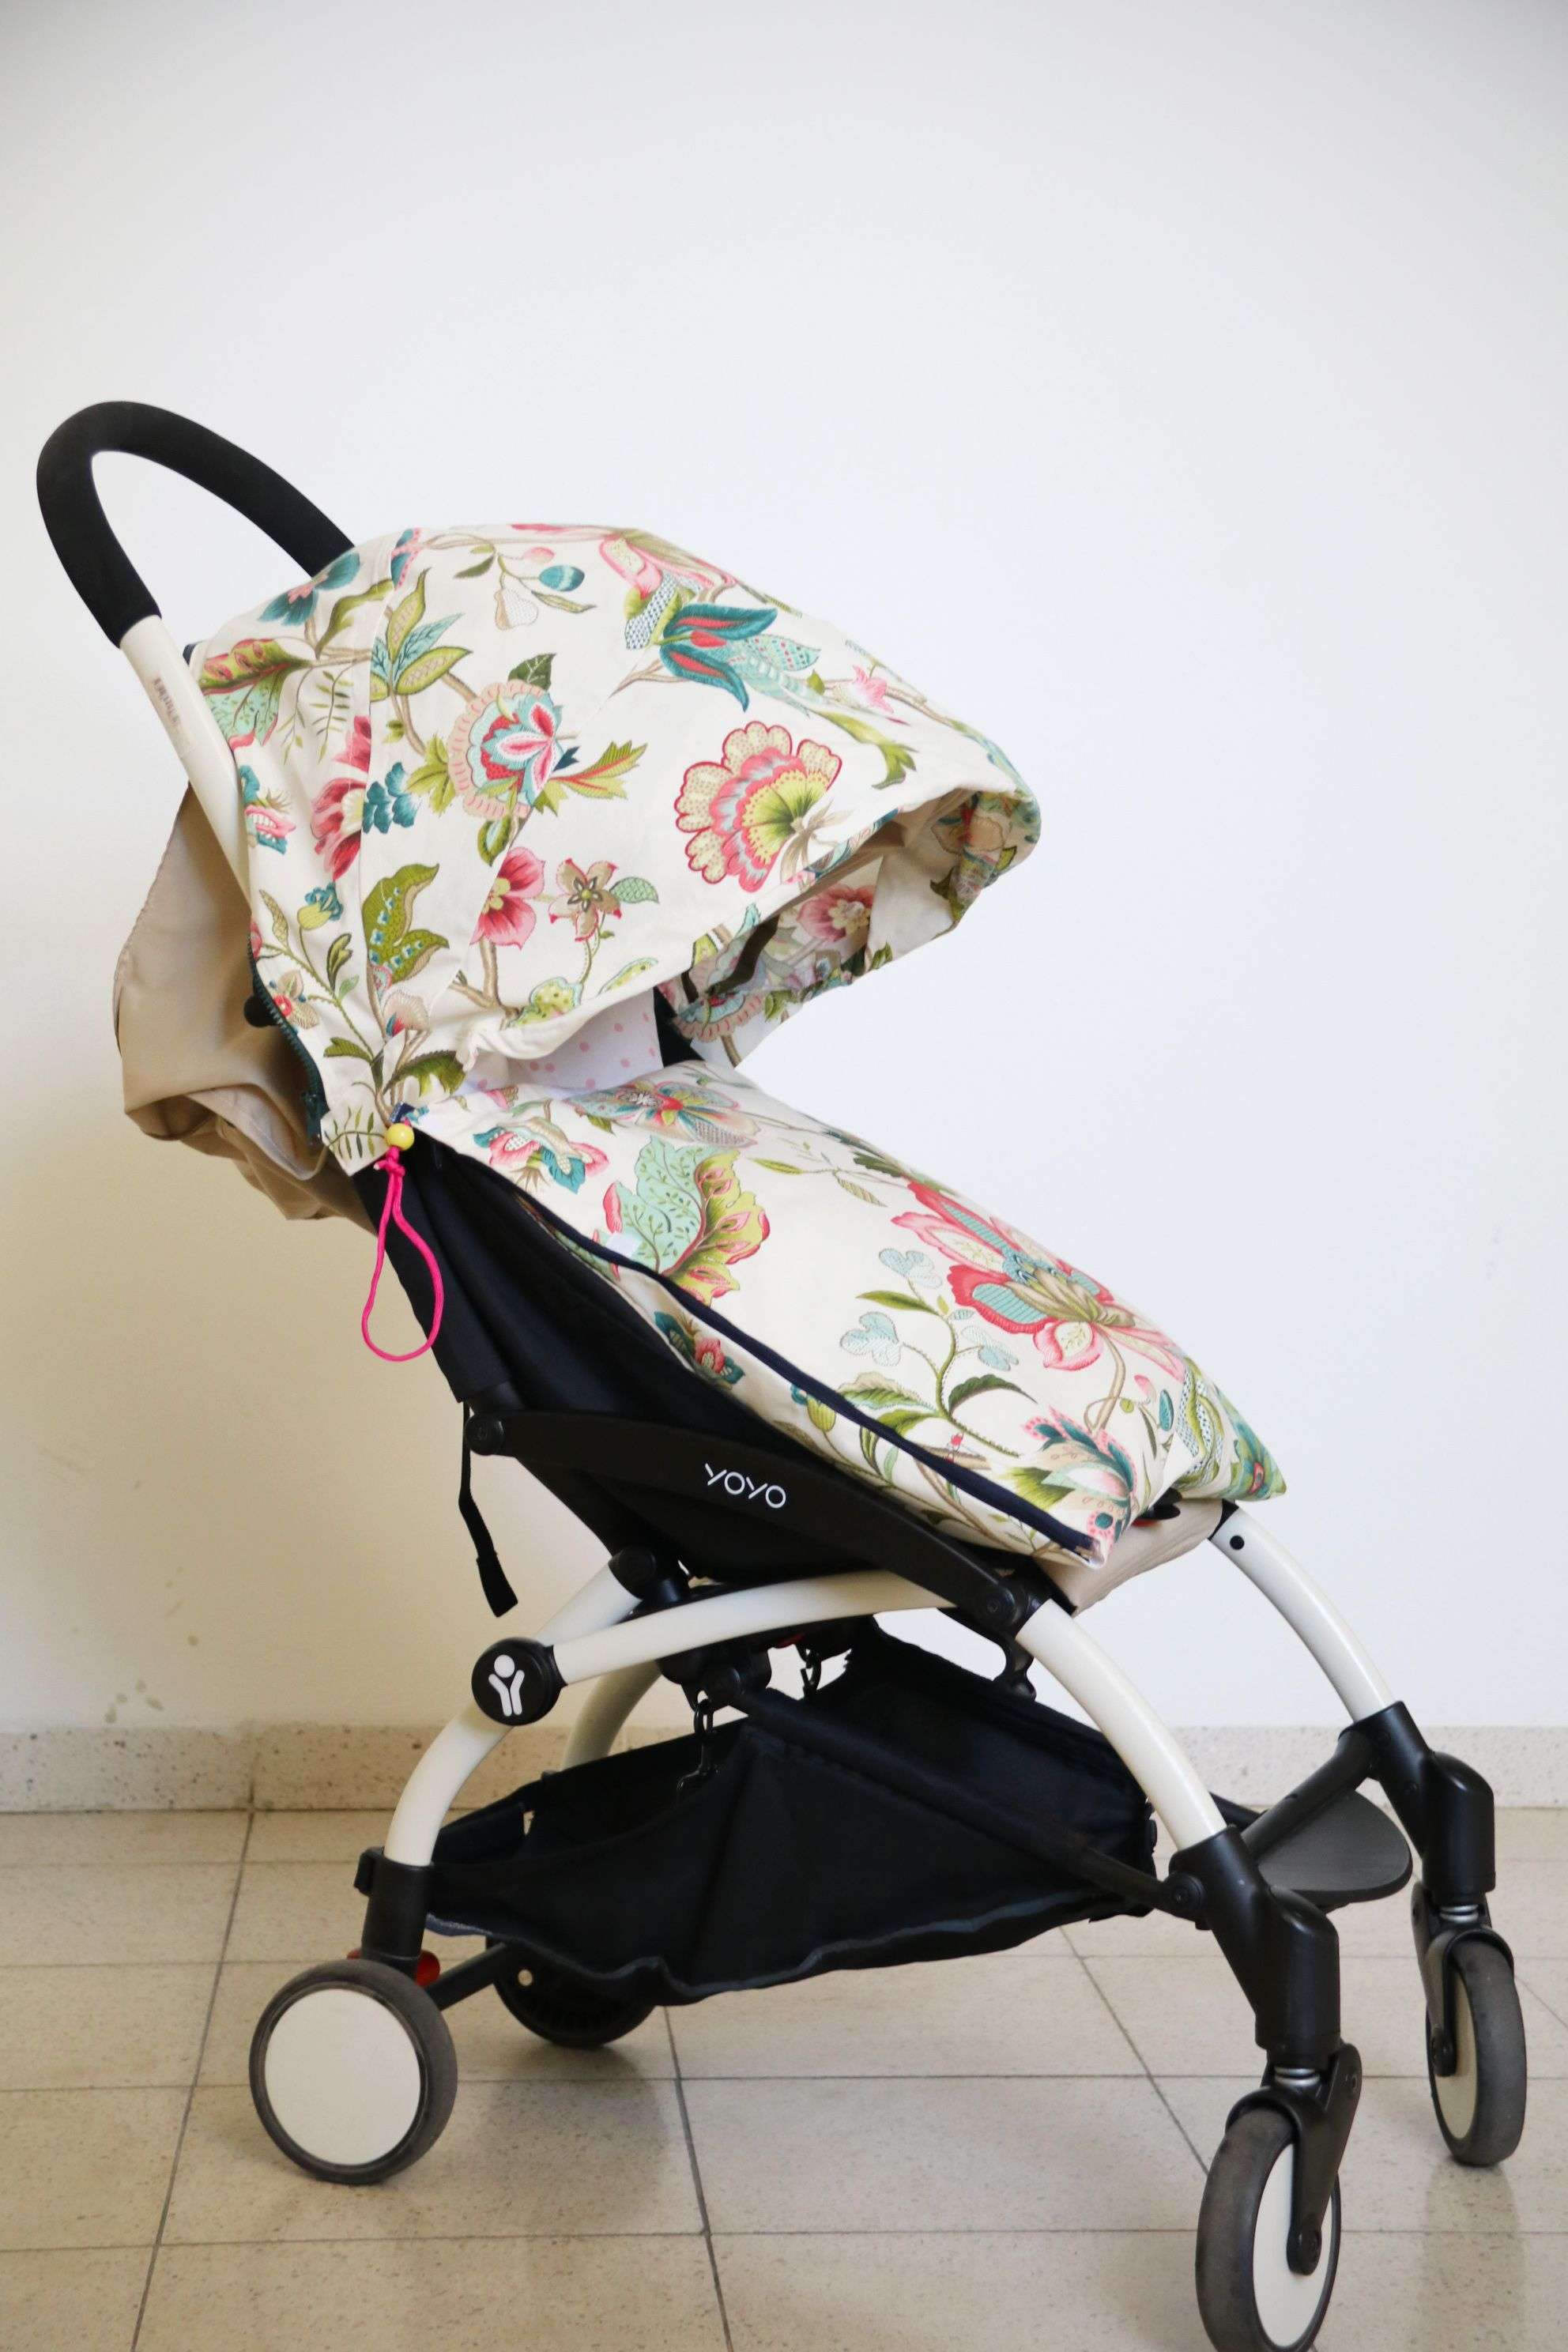 Yoyo babyzen stroller custom cover Stroller, Babyzen